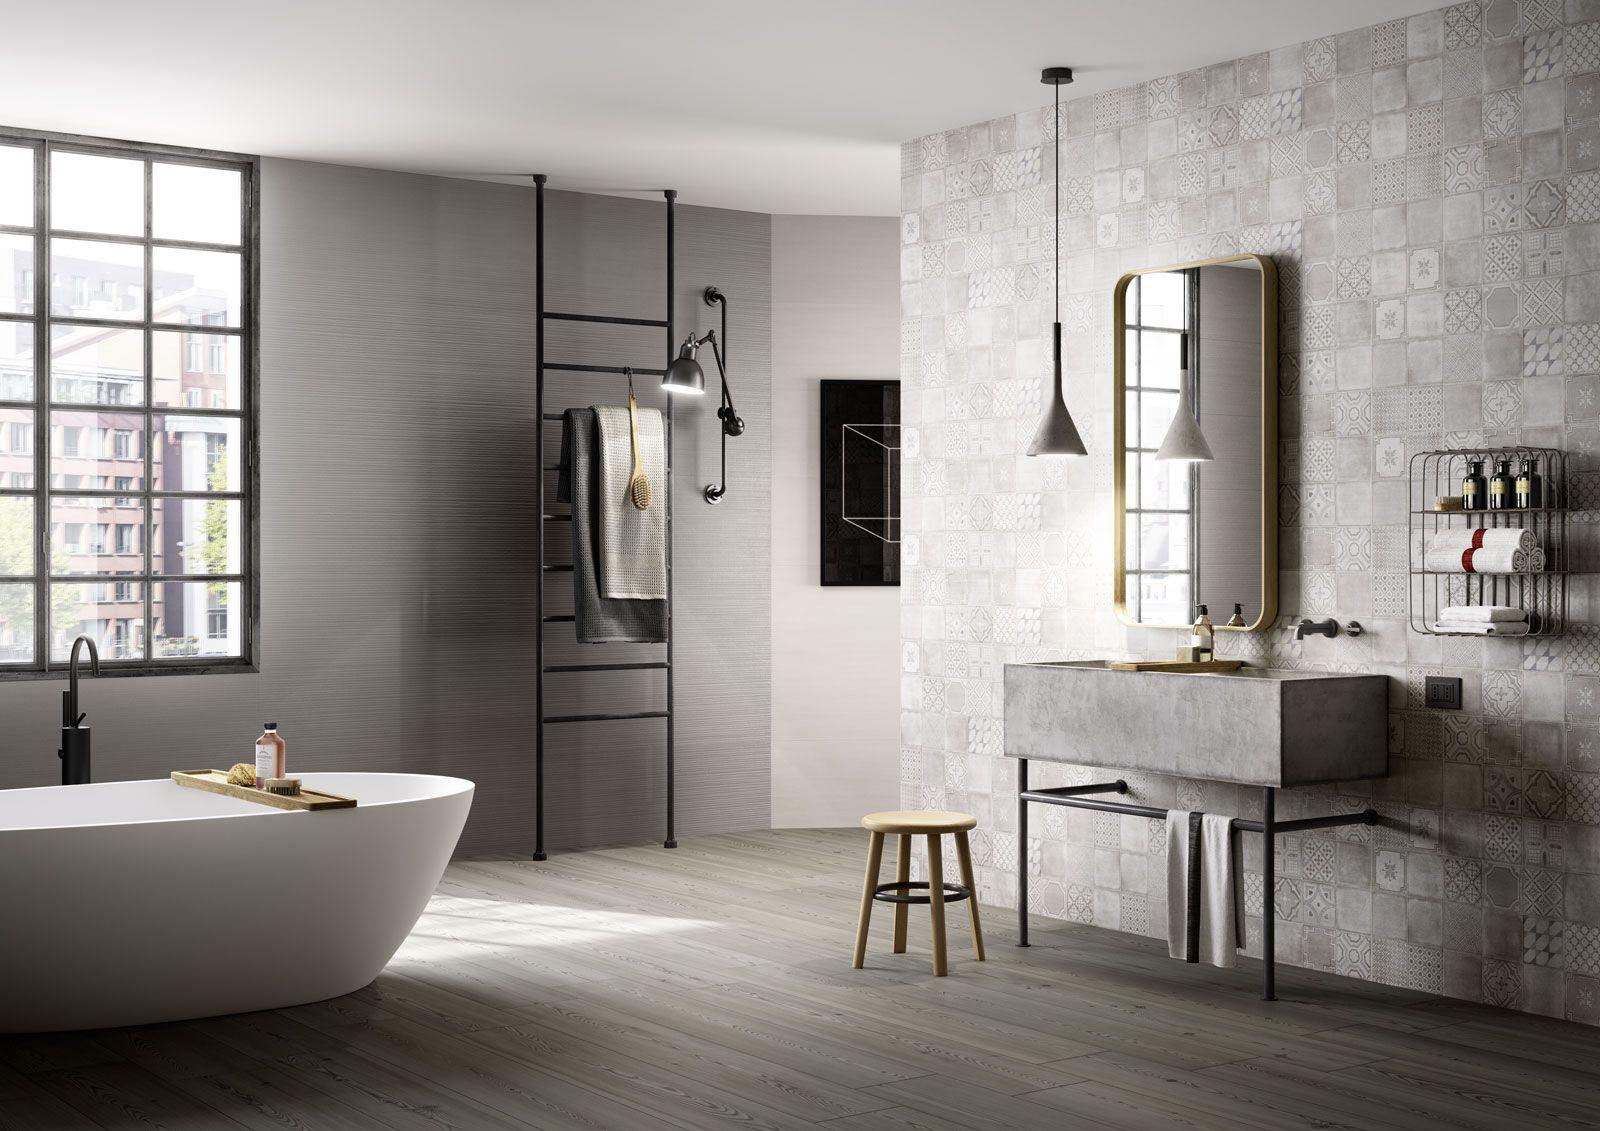 bathroom flooring ceramic and porcelain stoneware marazzi badkamer pinterest badezimmer. Black Bedroom Furniture Sets. Home Design Ideas